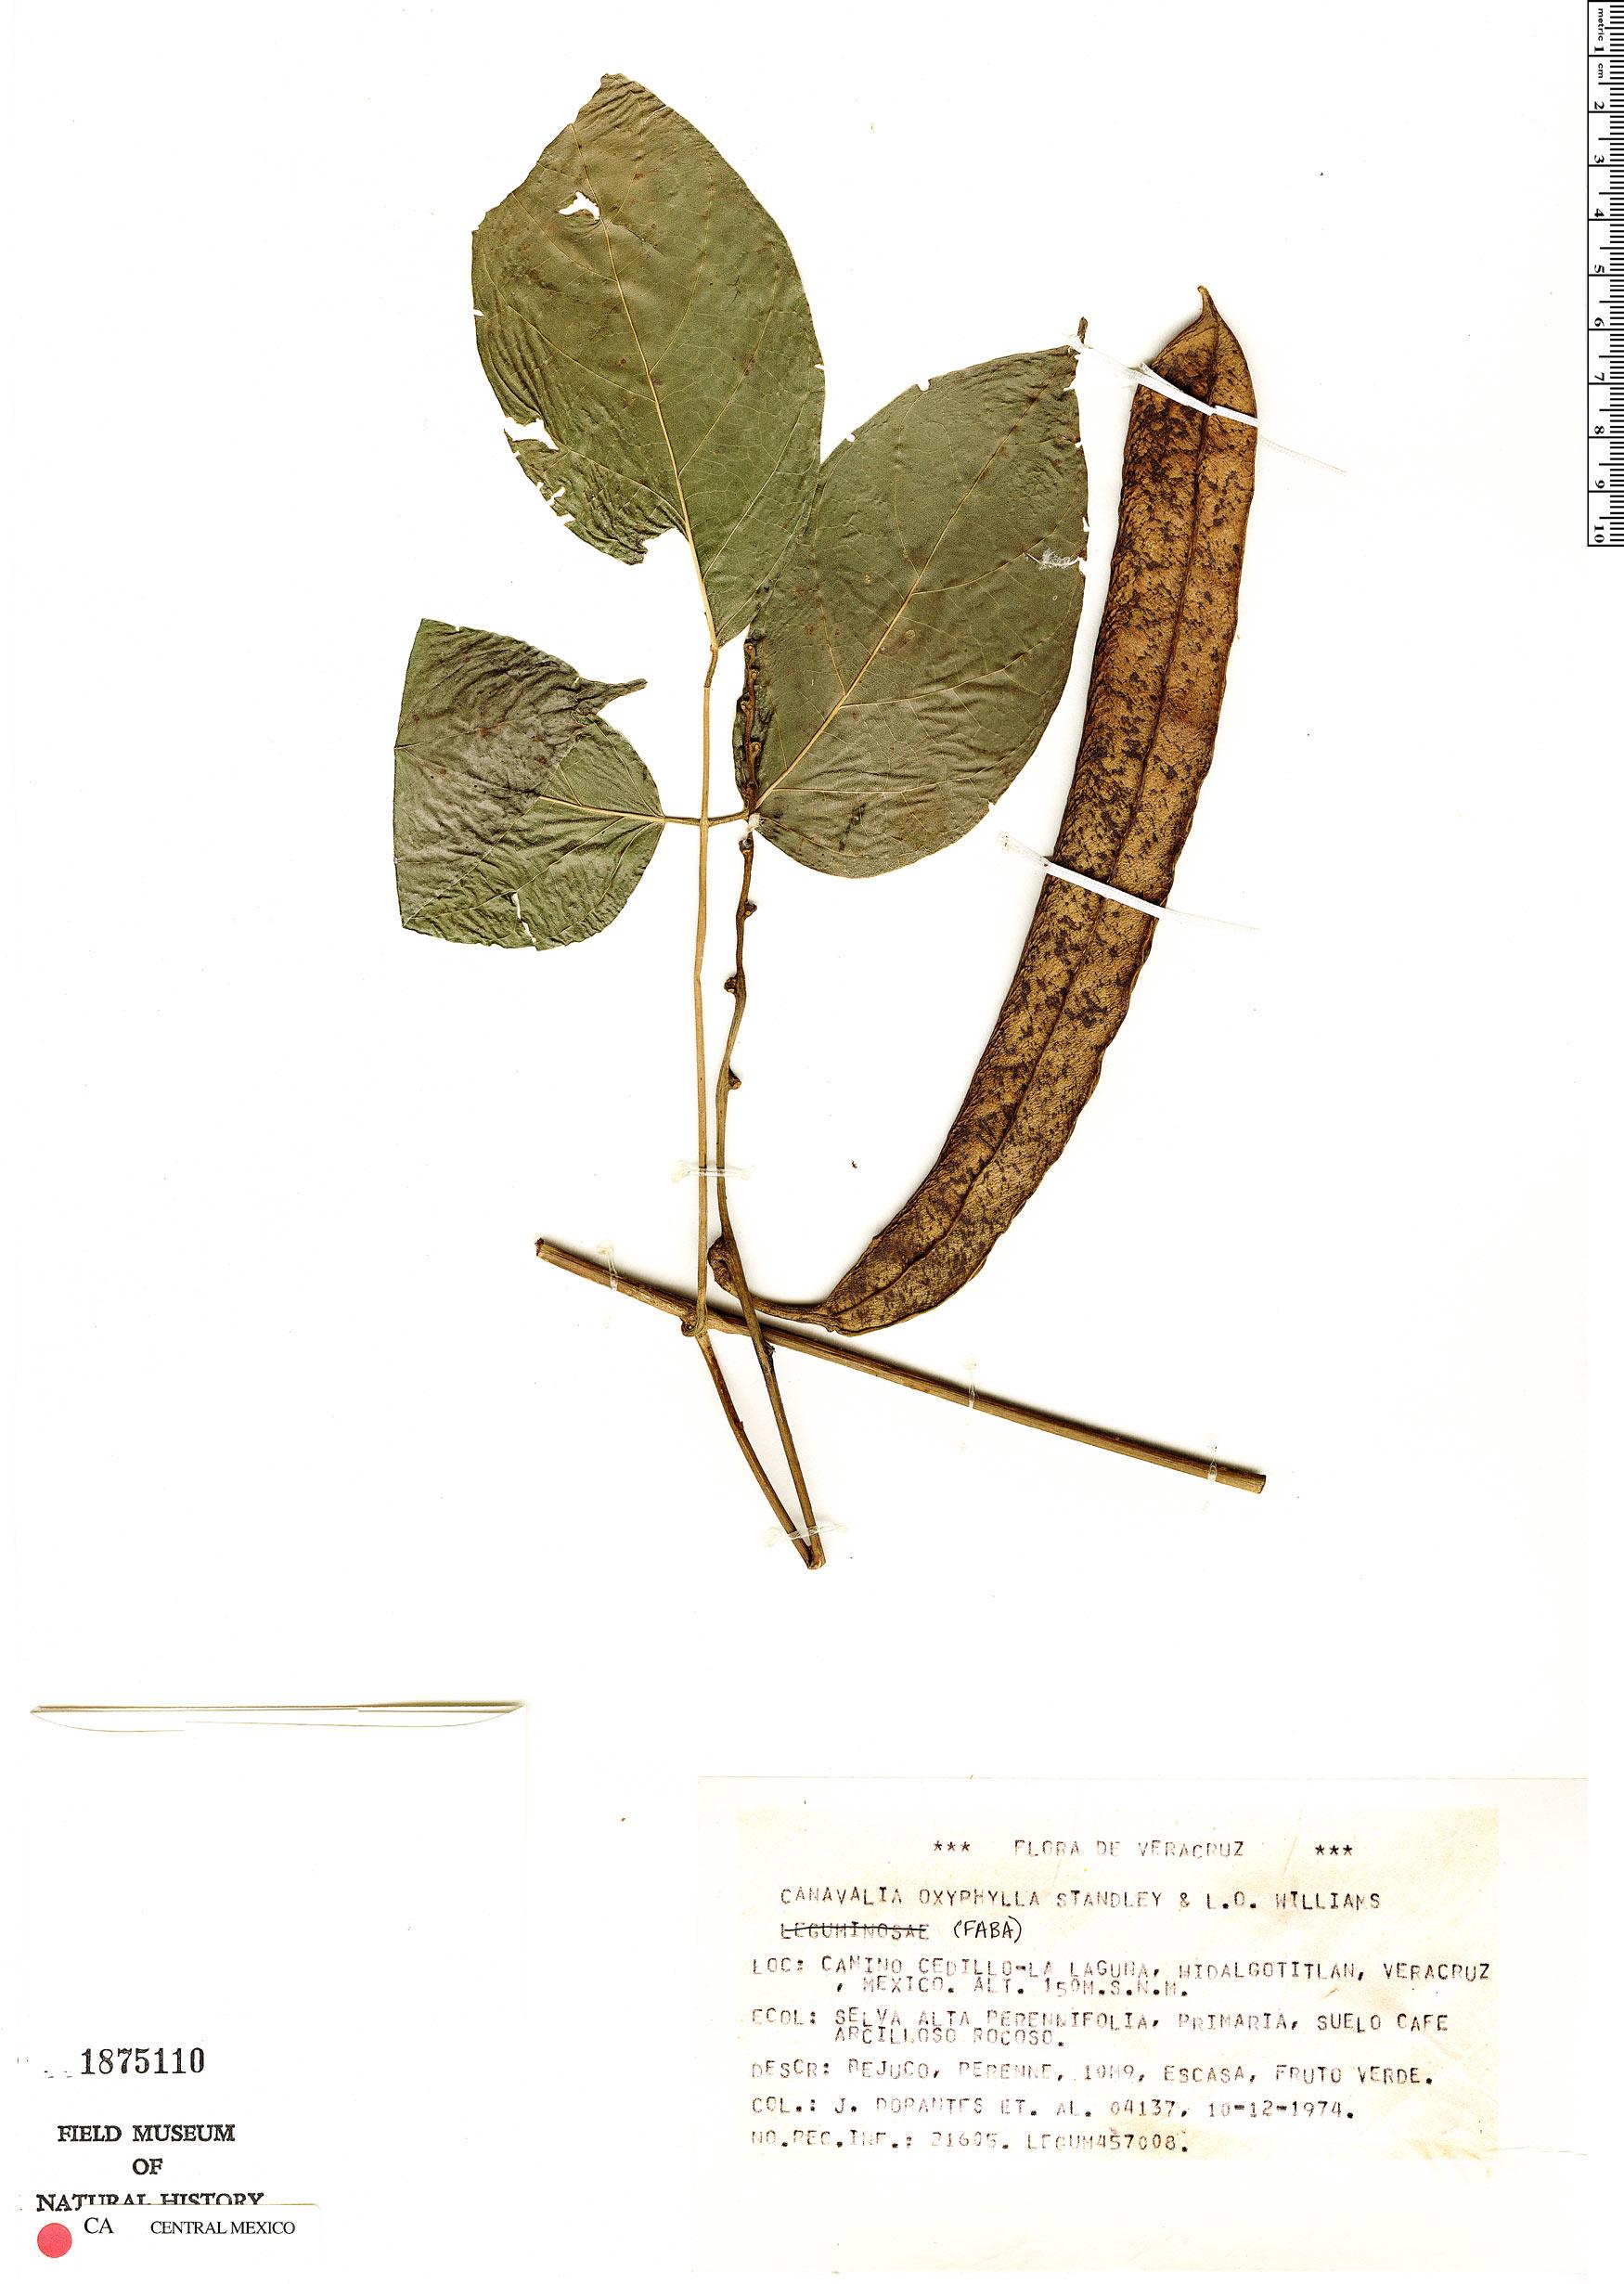 Specimen: Canavalia oxyphylla